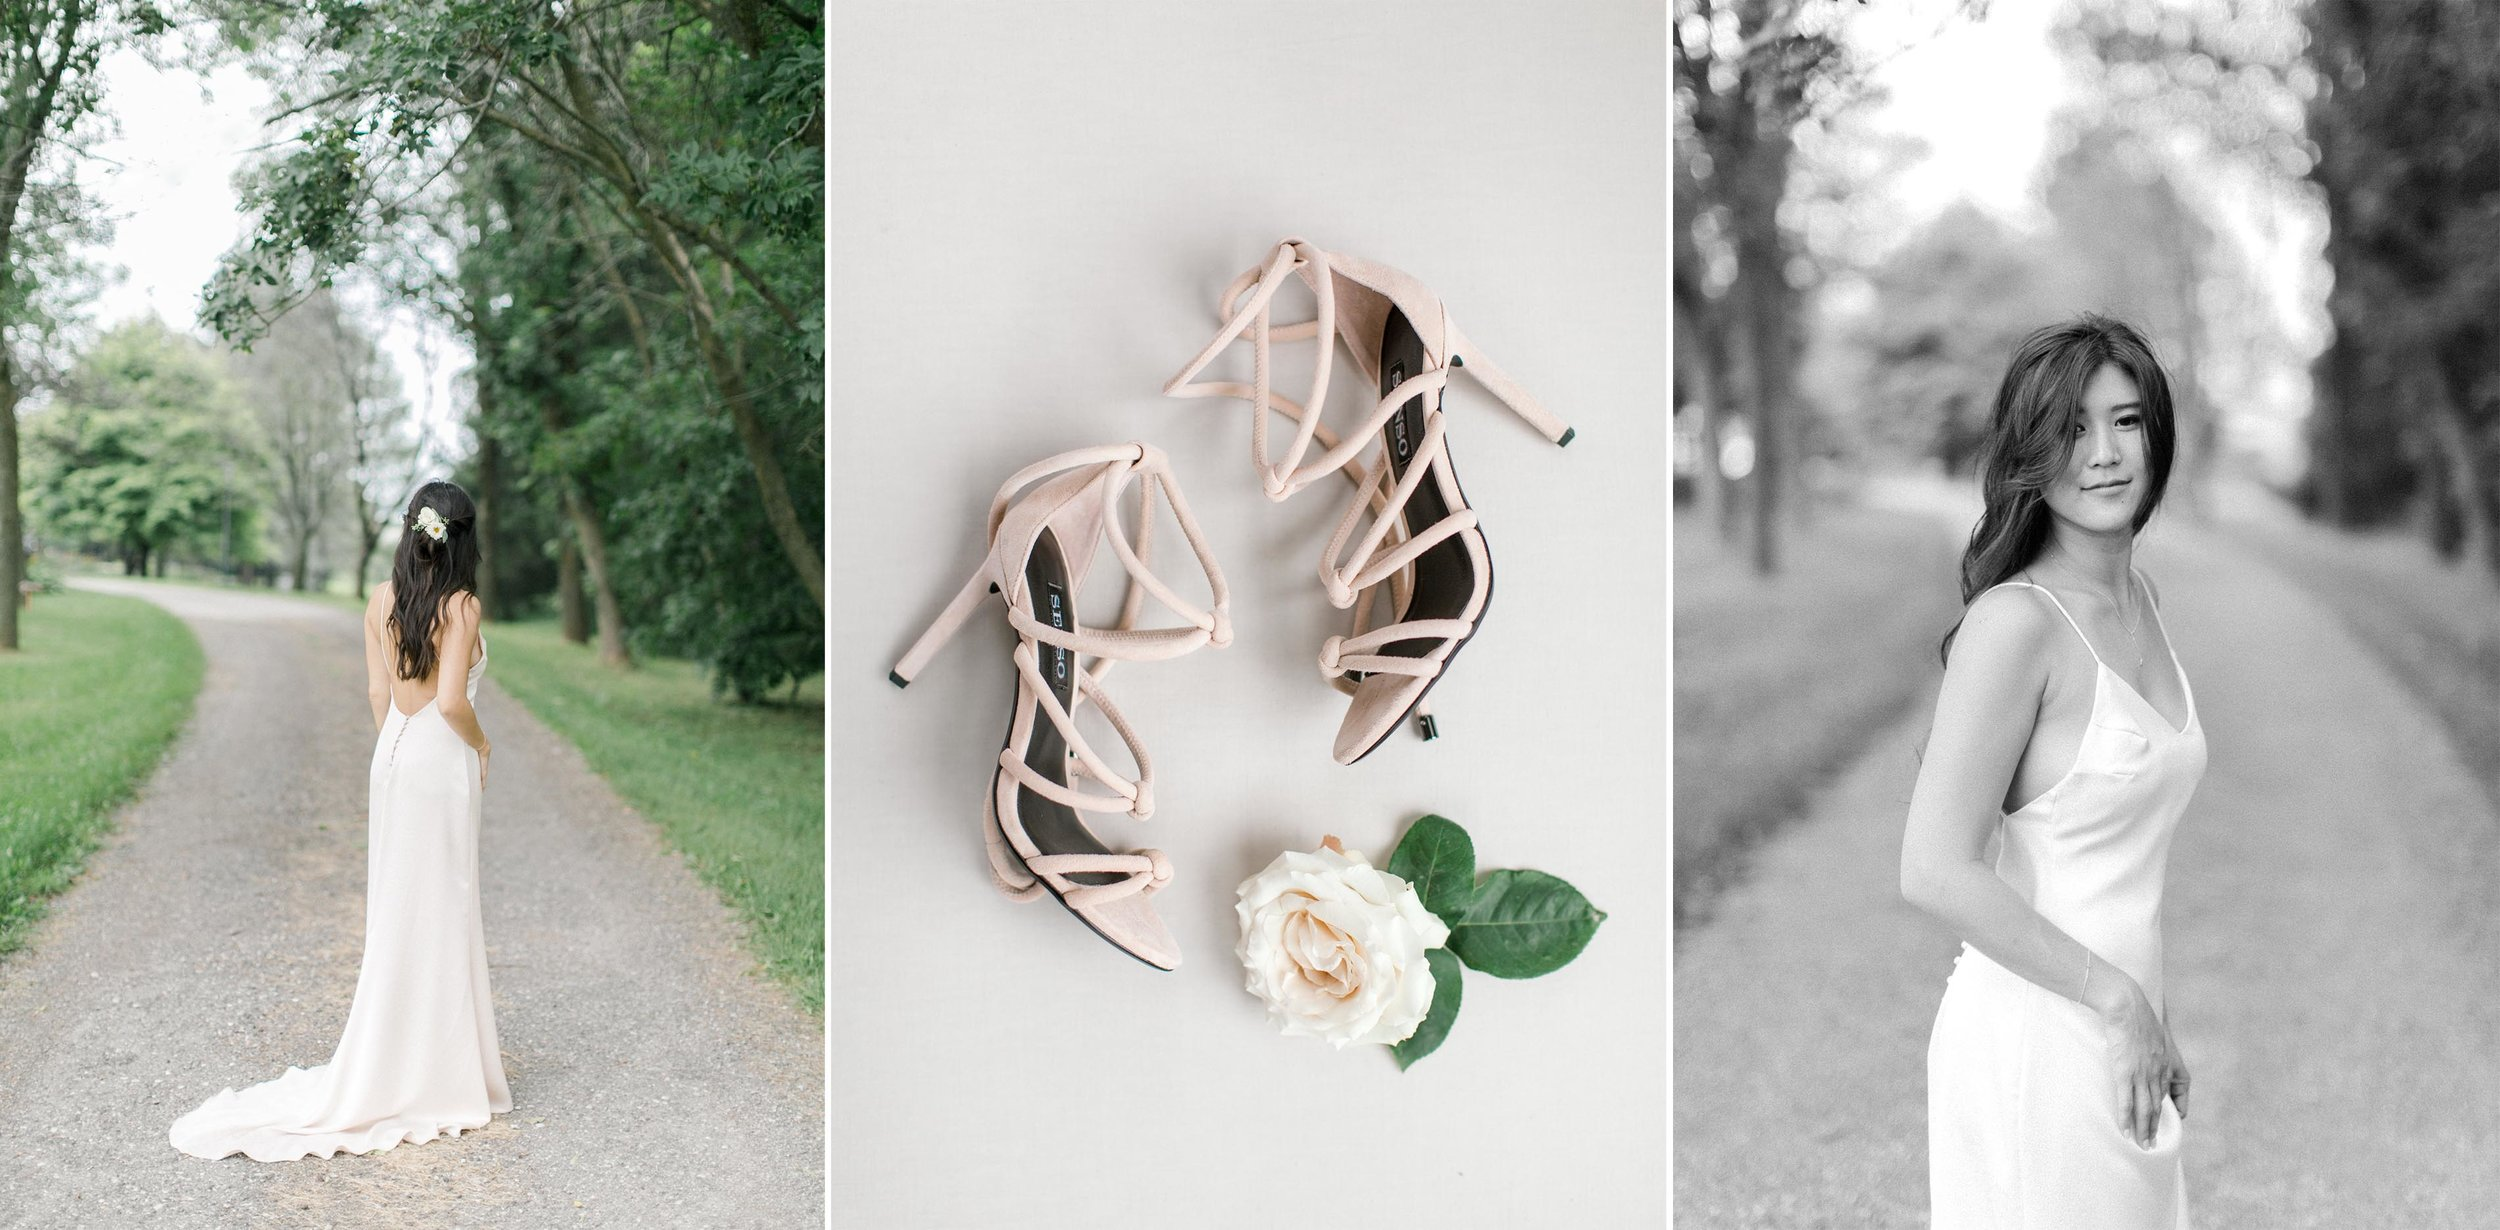 toronto-wedding-photographer-nicola-prentis-richelle-hunter-photography-videography.jpg